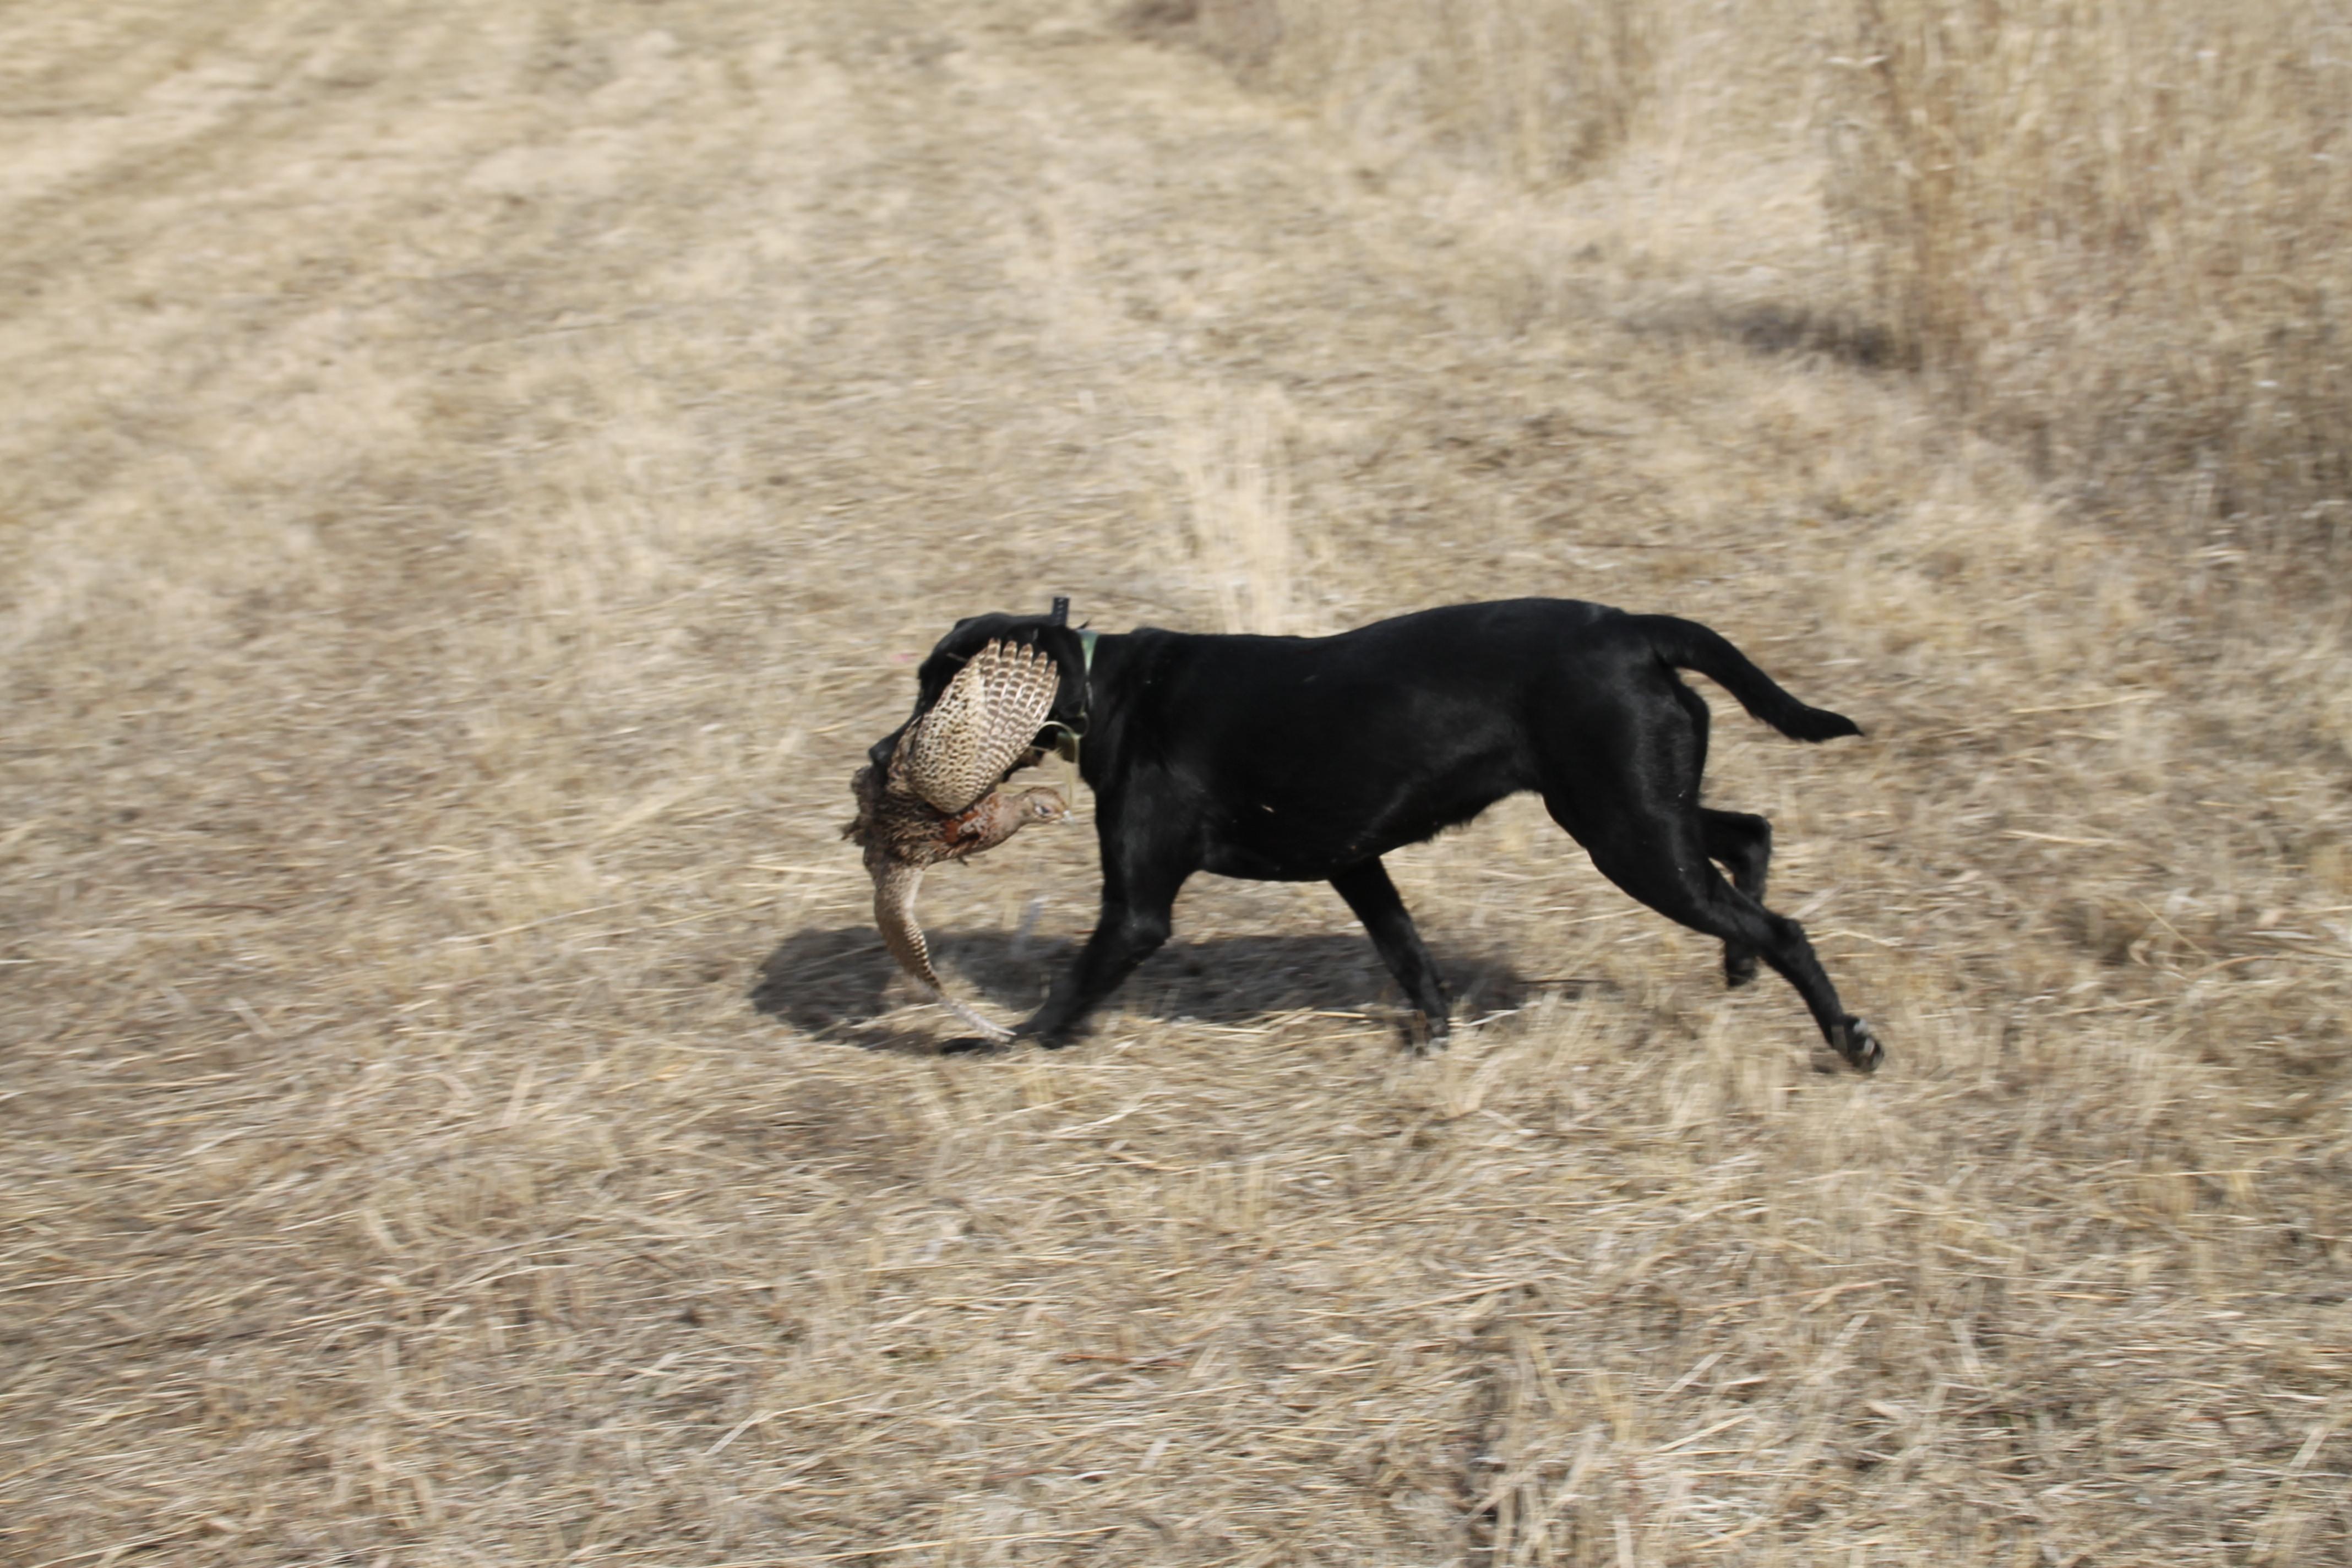 Dog retrieving pheasant